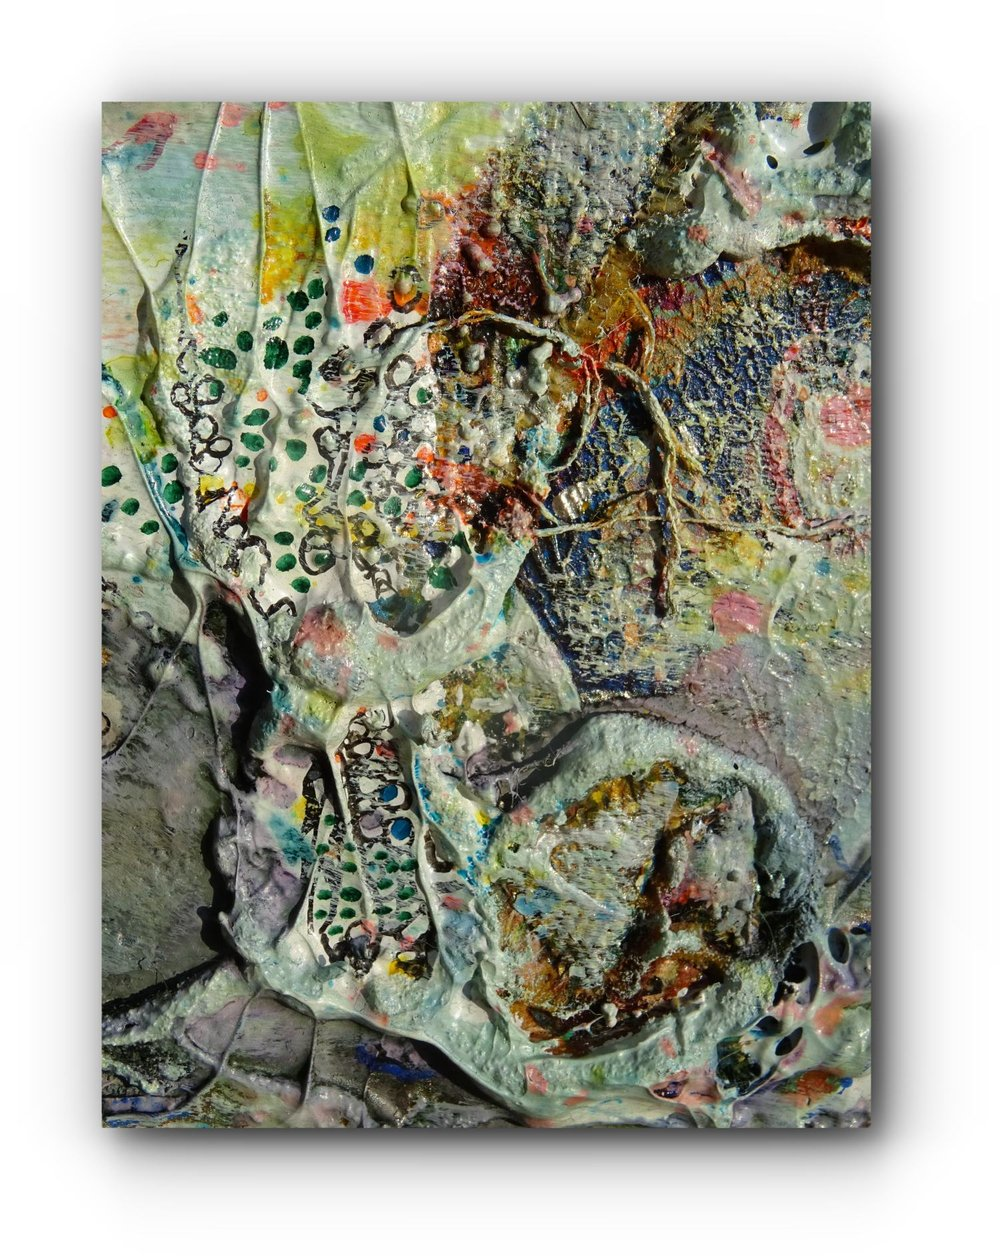 painting-detail-8-birds-eye-view-ingress-vortices.jpg